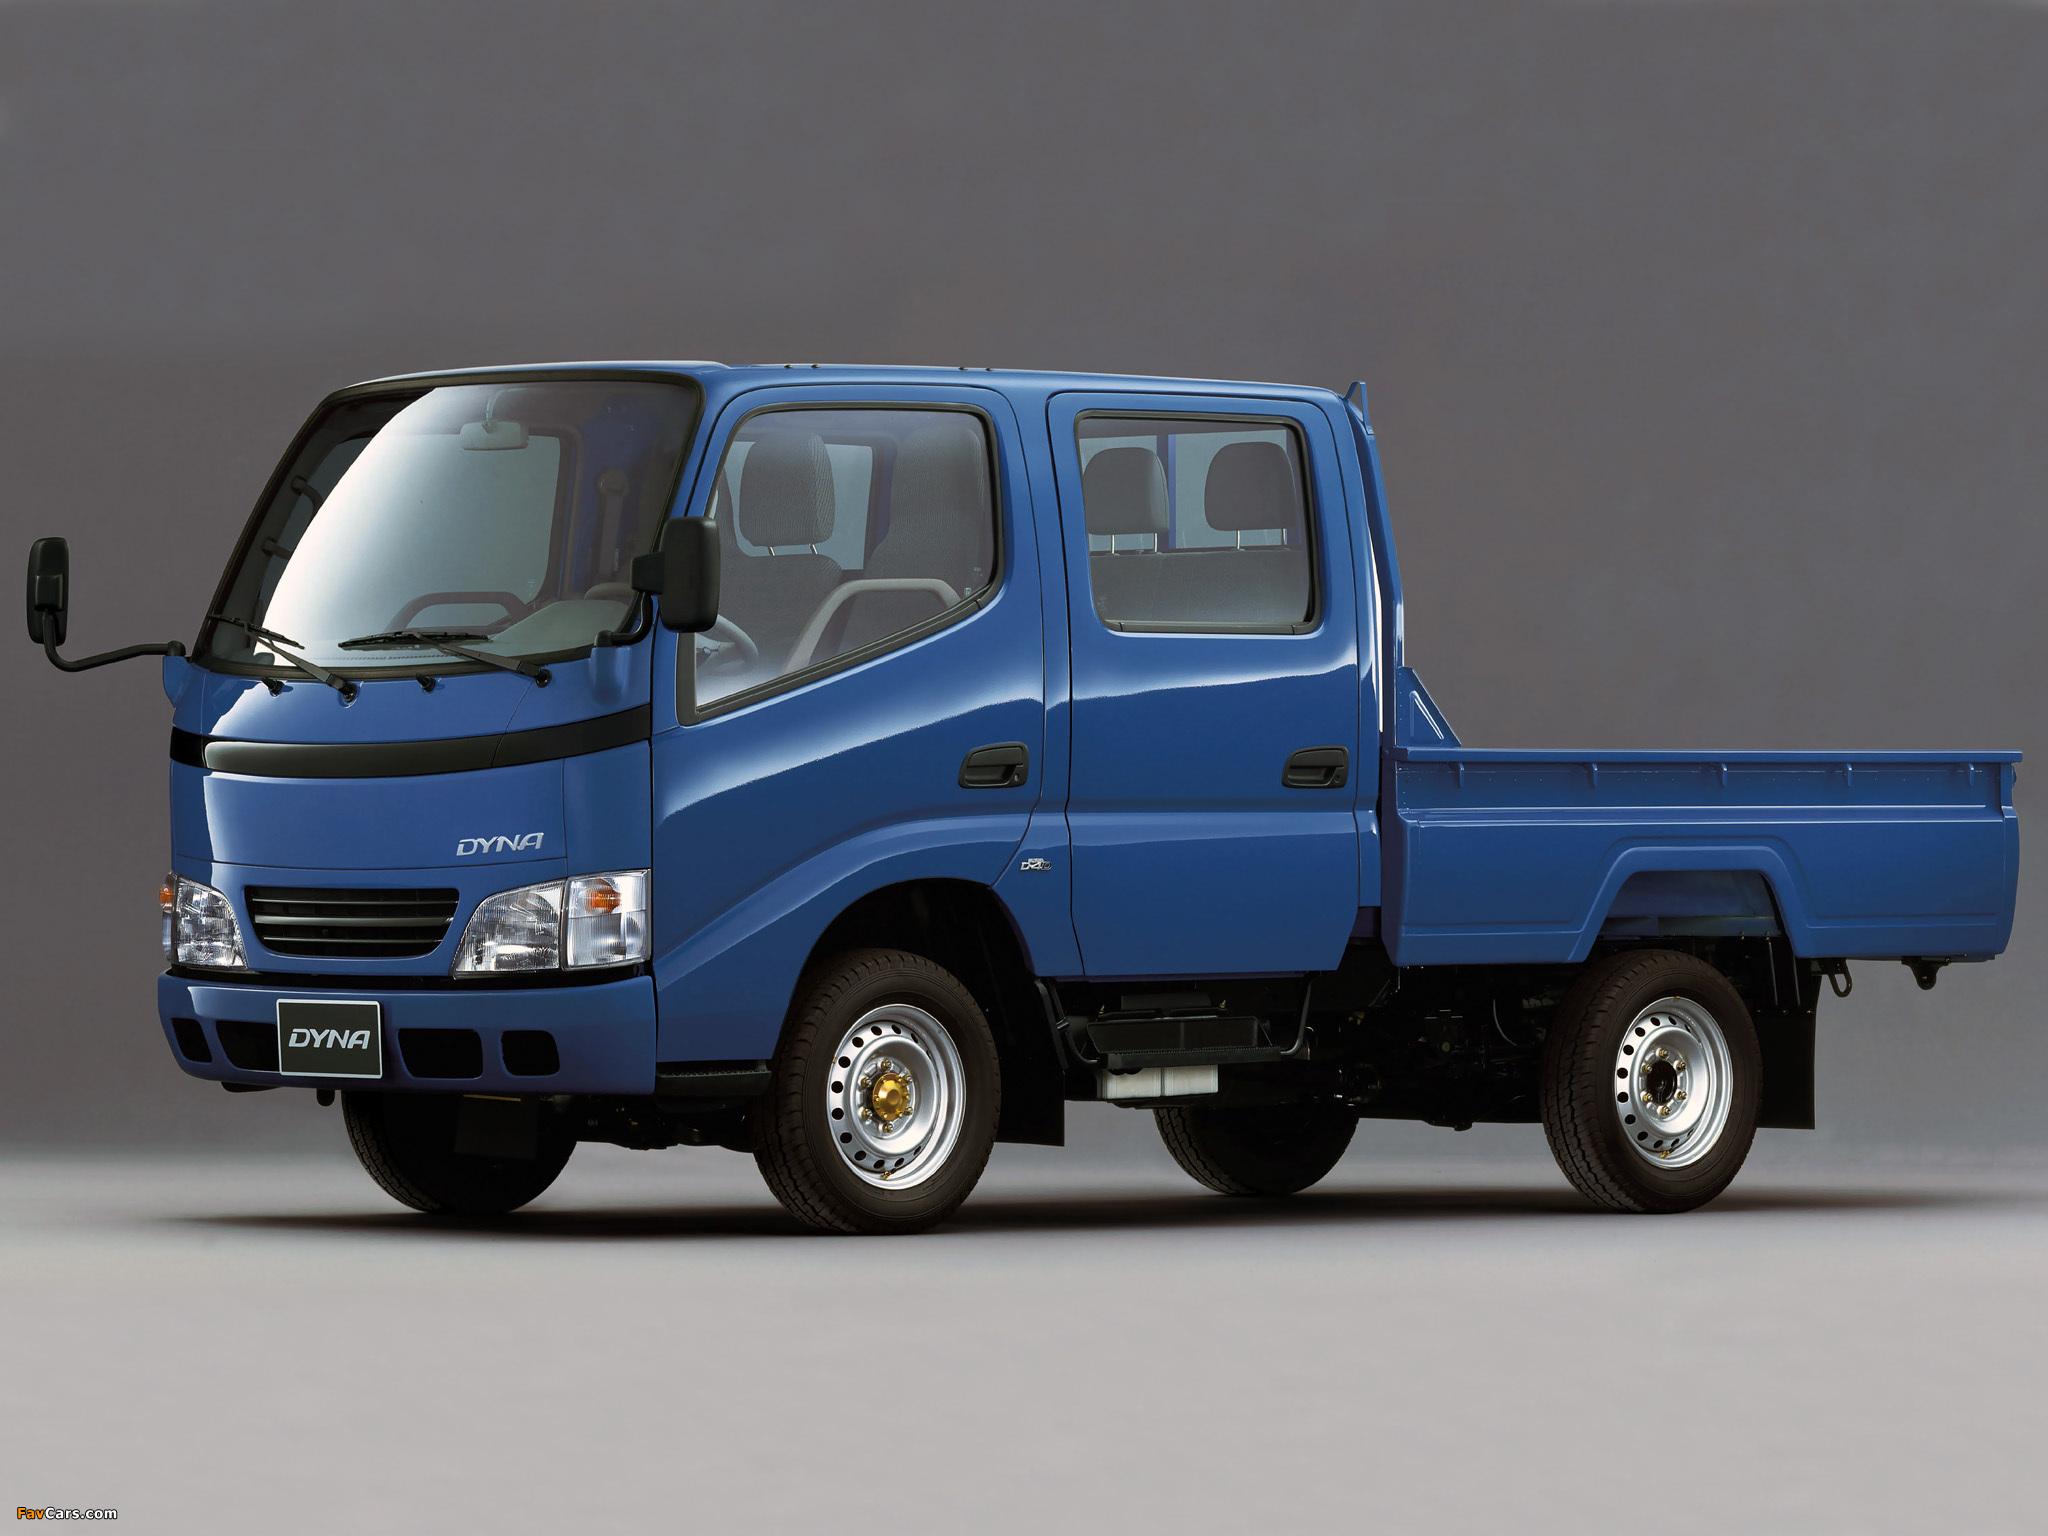 Toyota Dyna Truck Dimensions